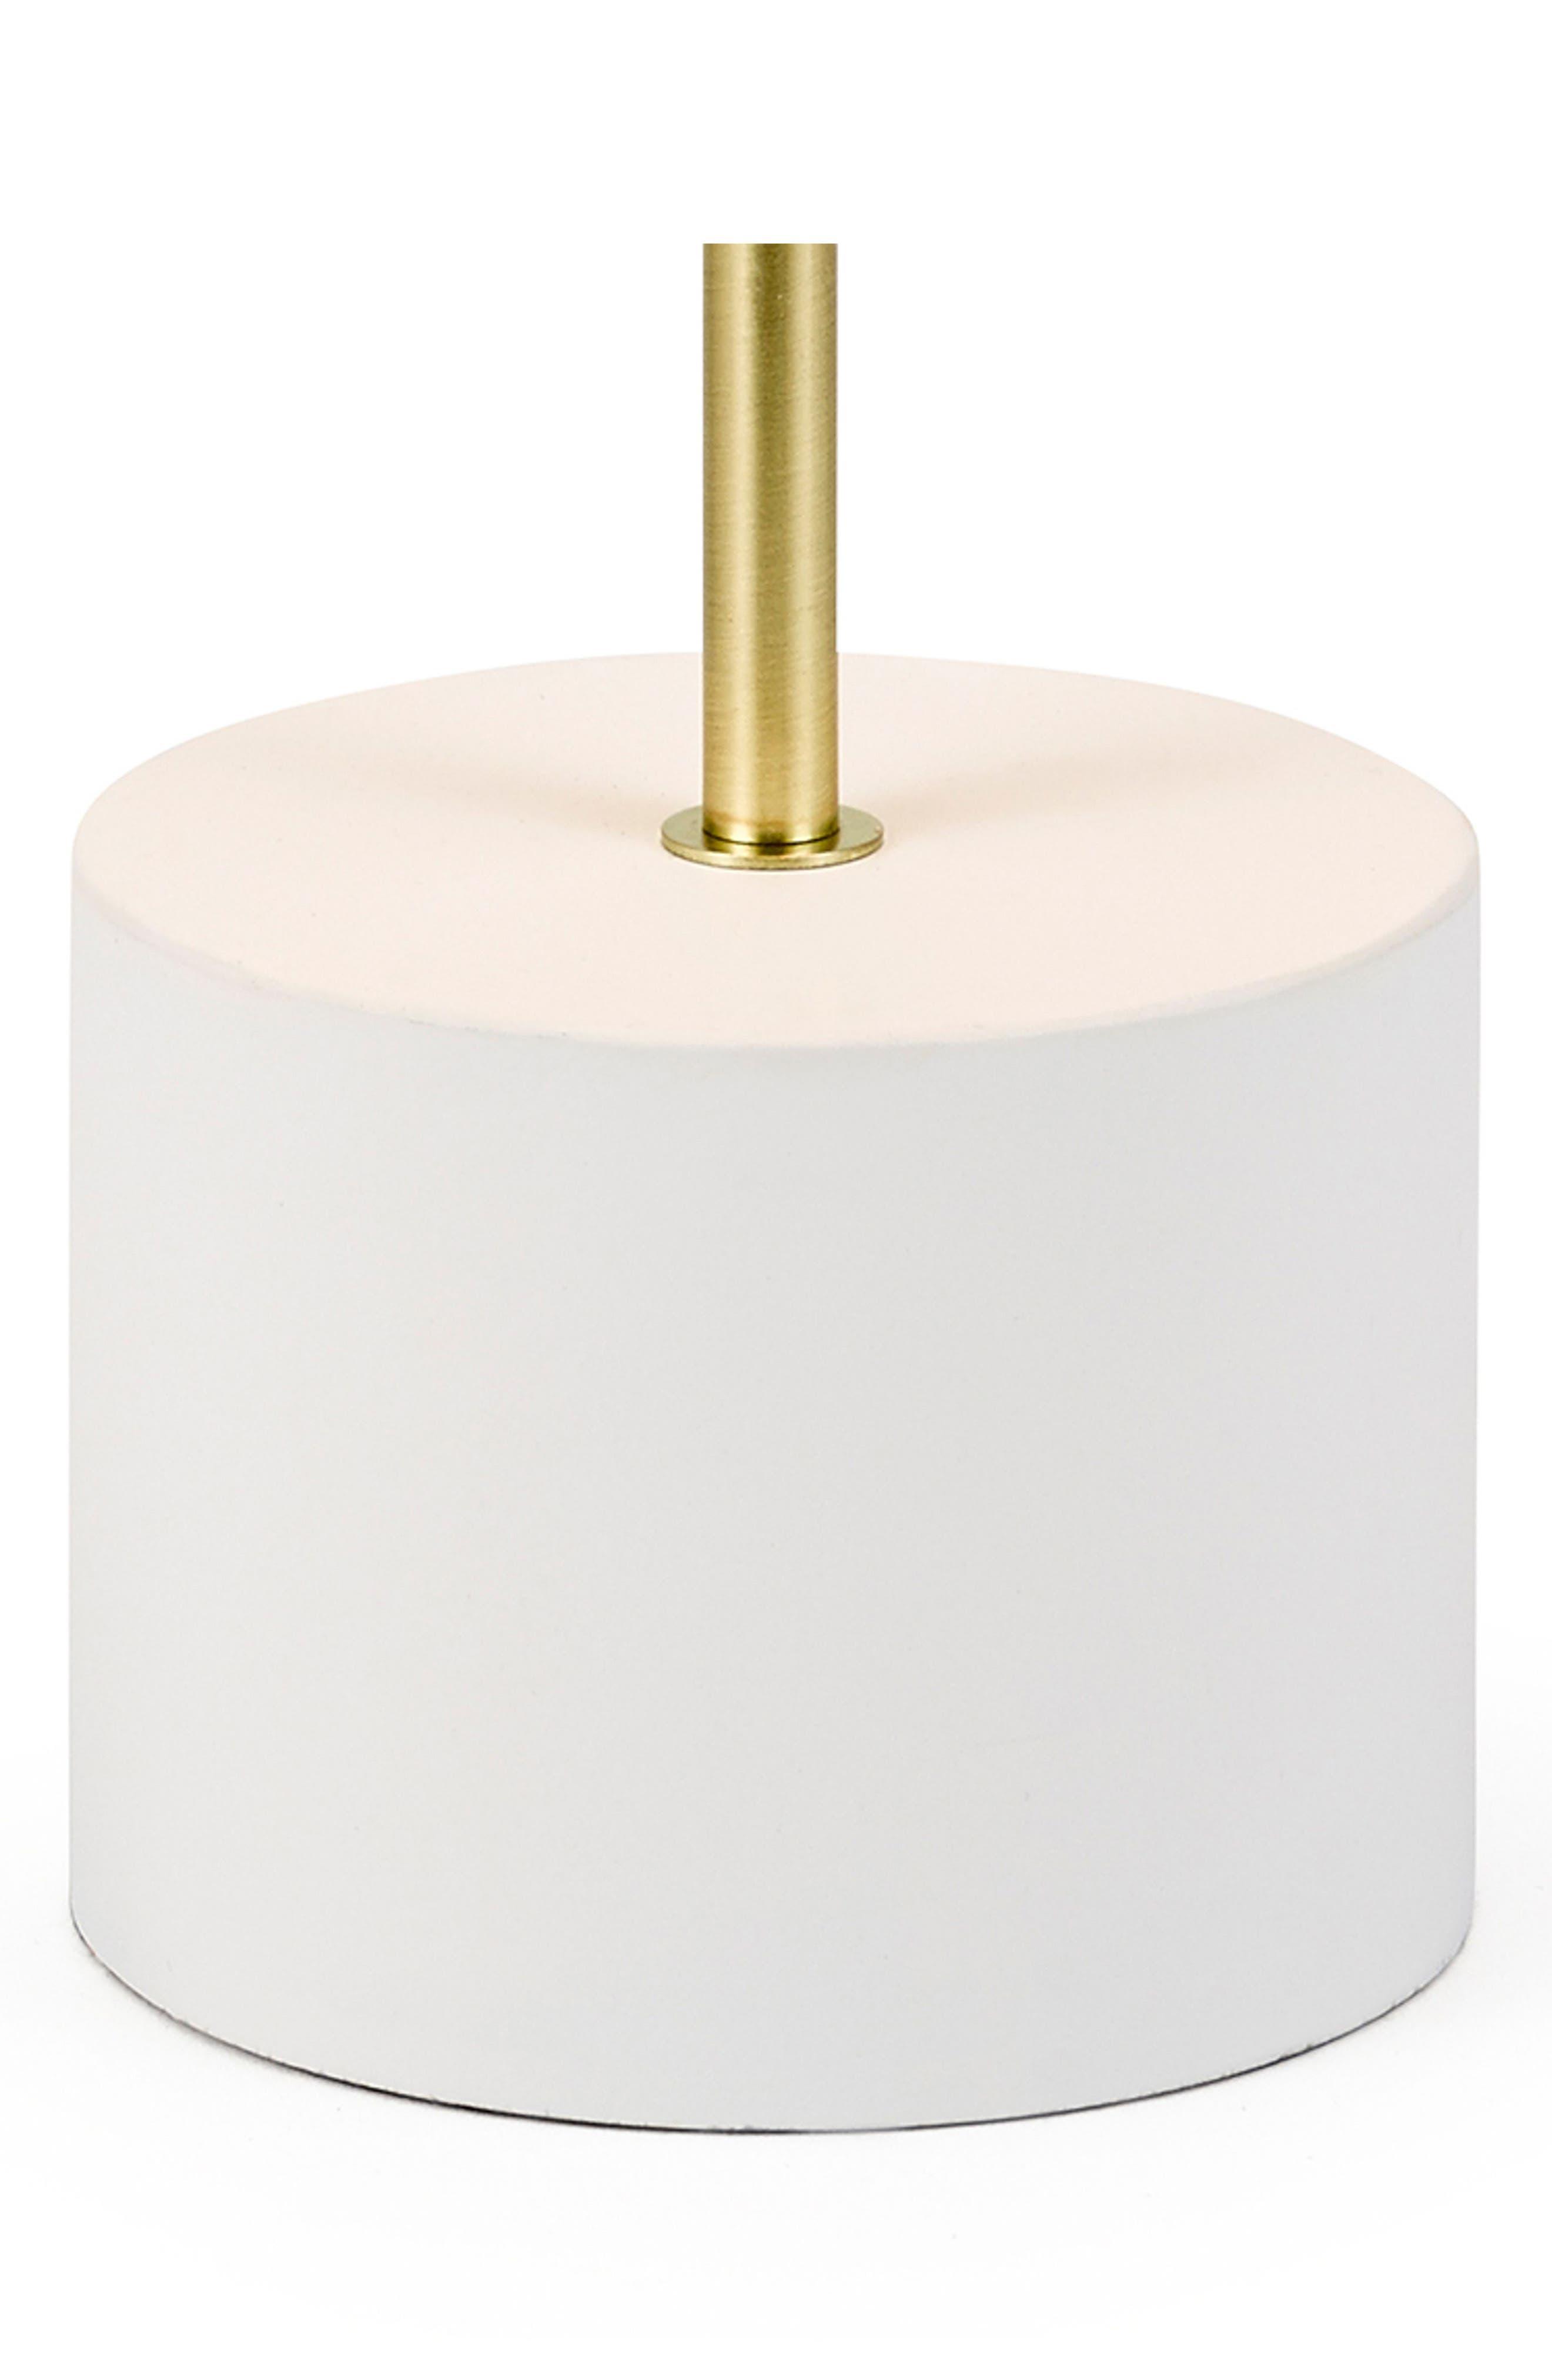 Elemental Table Lamp,                             Alternate thumbnail 3, color,                             100